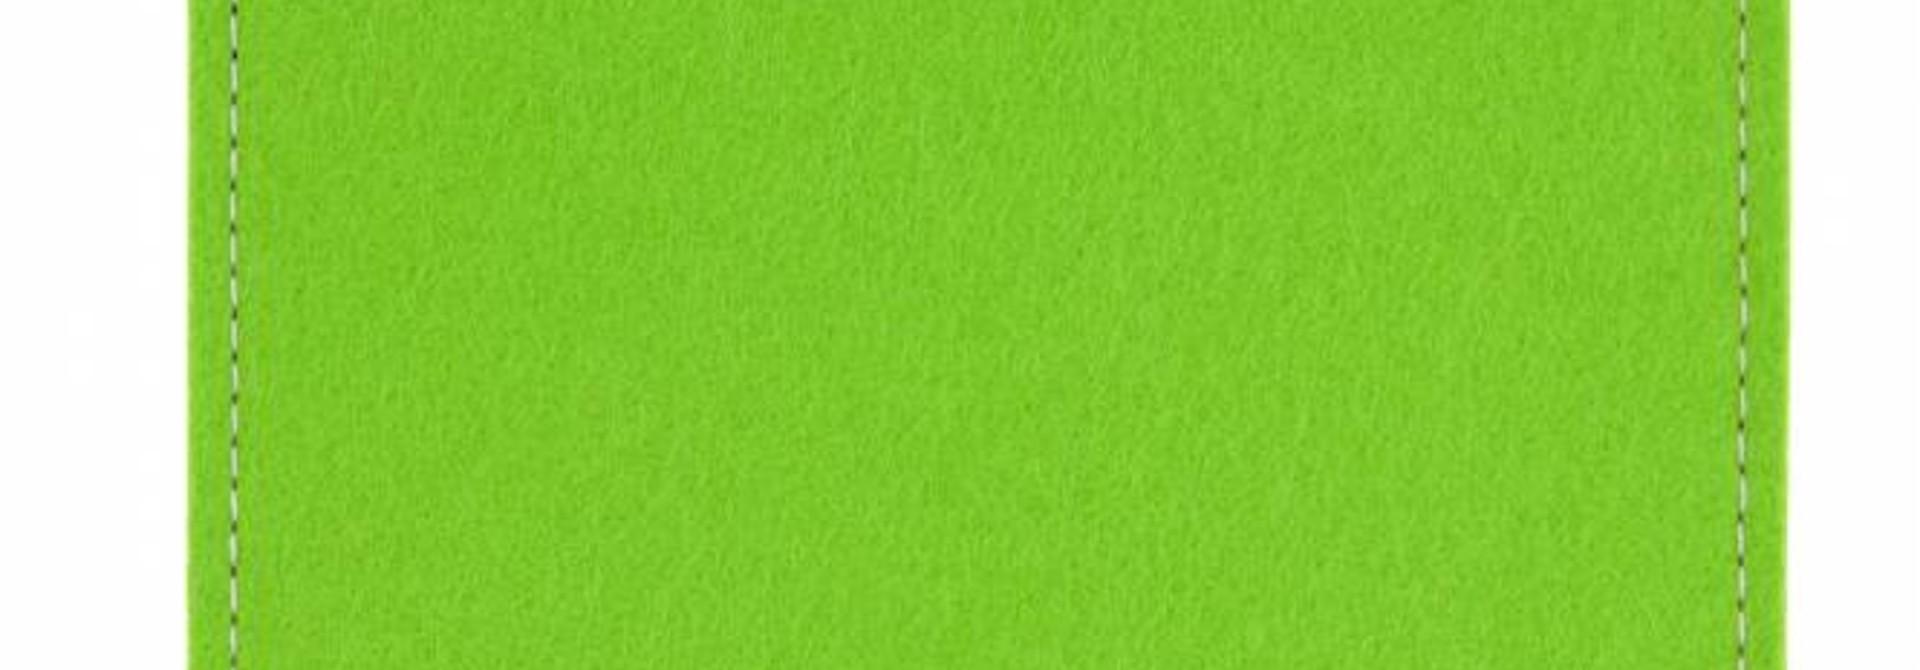 Intuos Sleeve Bright-Green